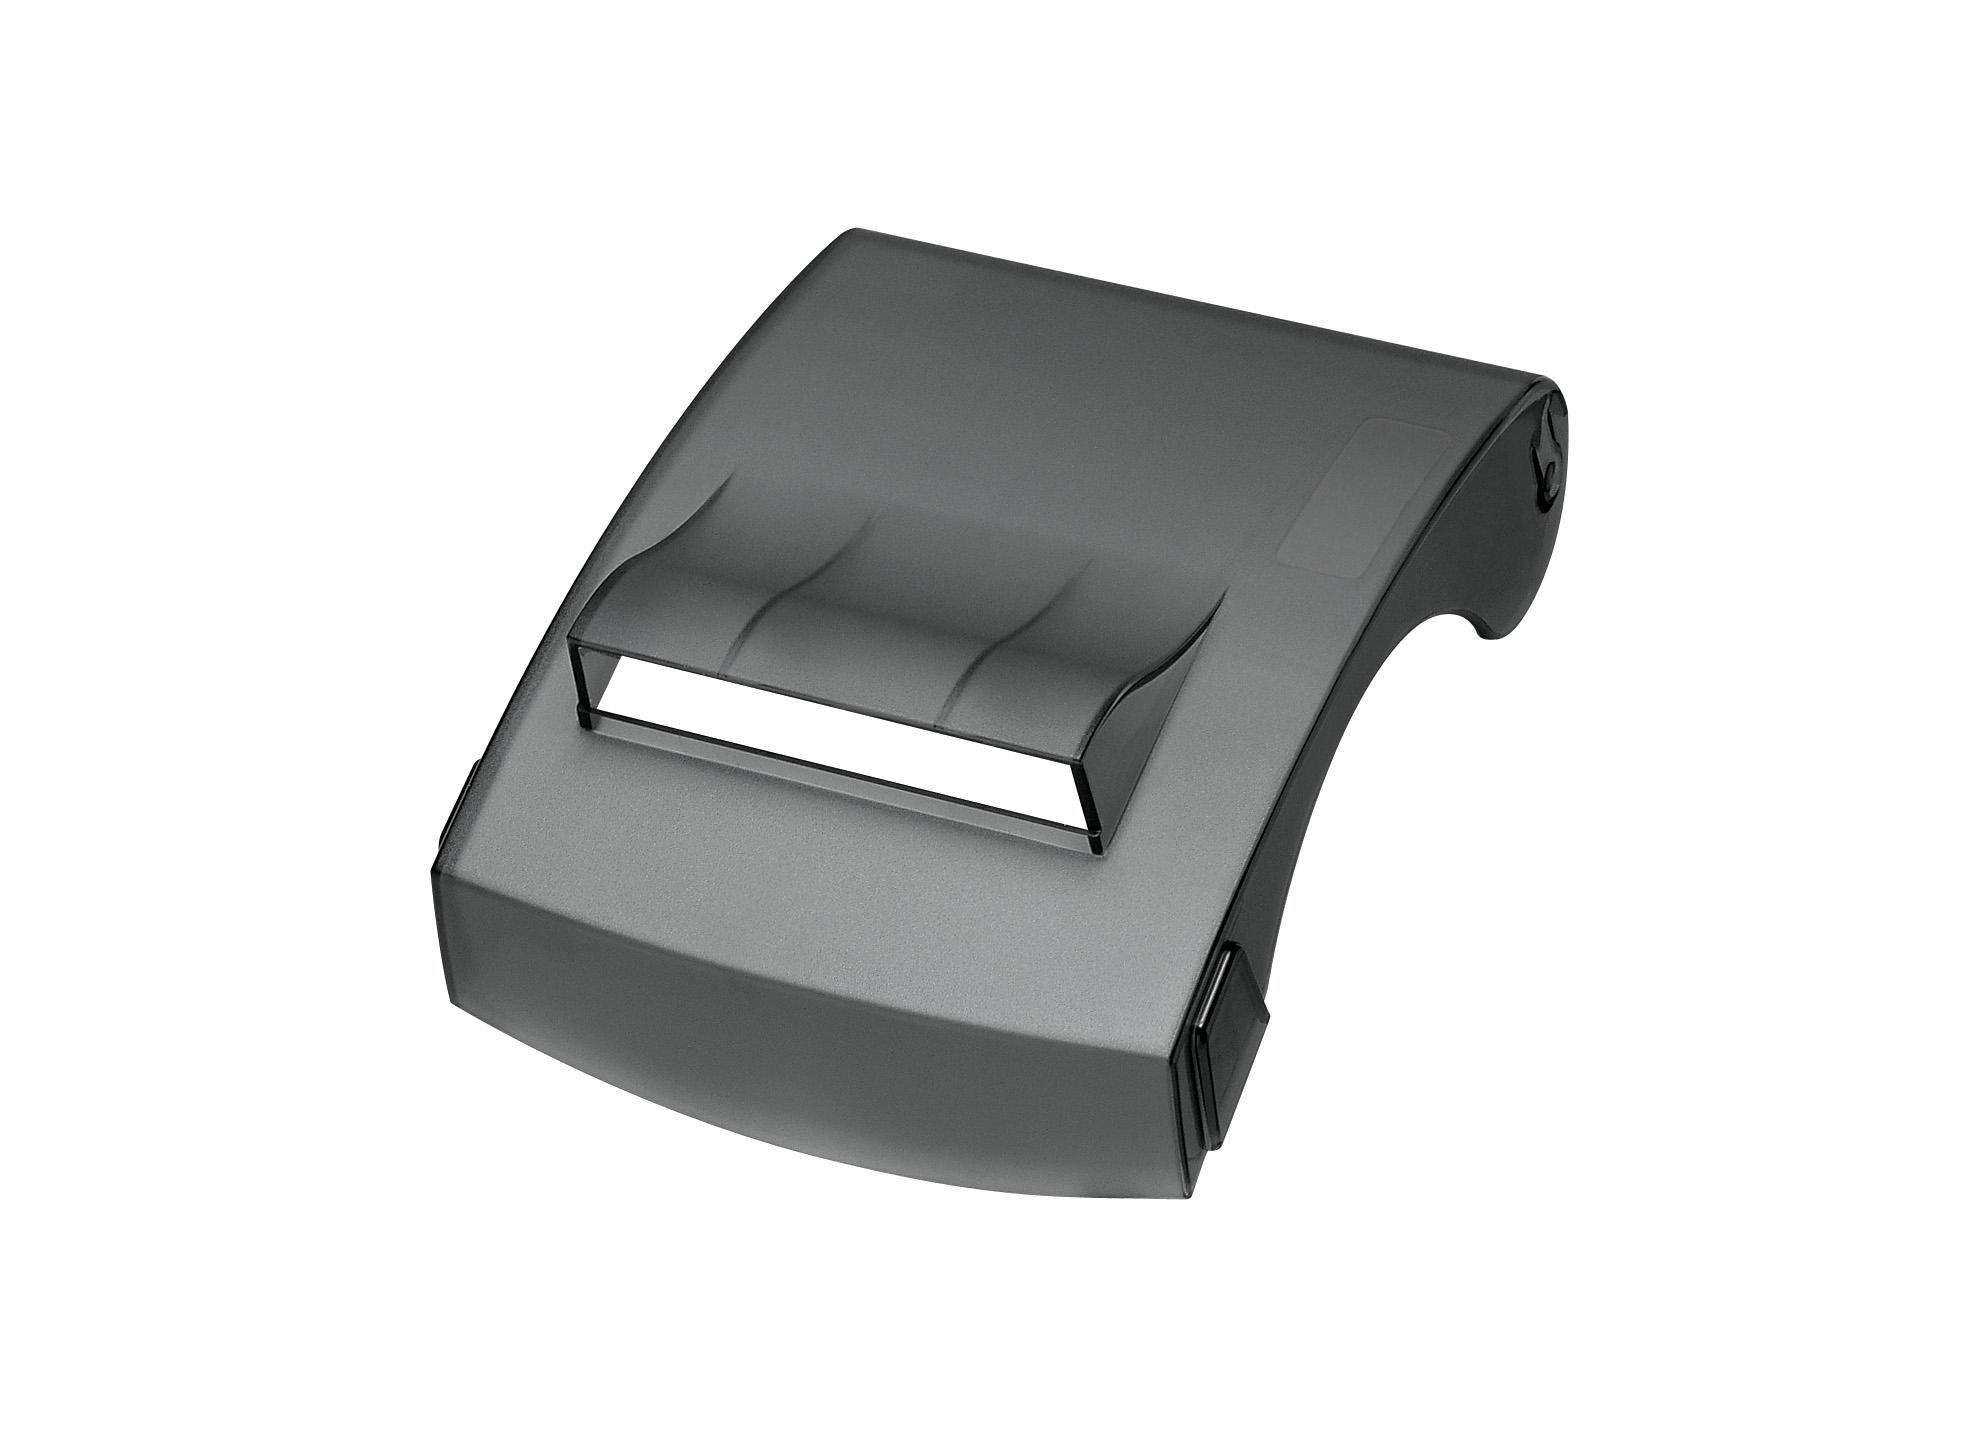 BIXOLON RSC-350 - Drucker-Spritzwasserschutz